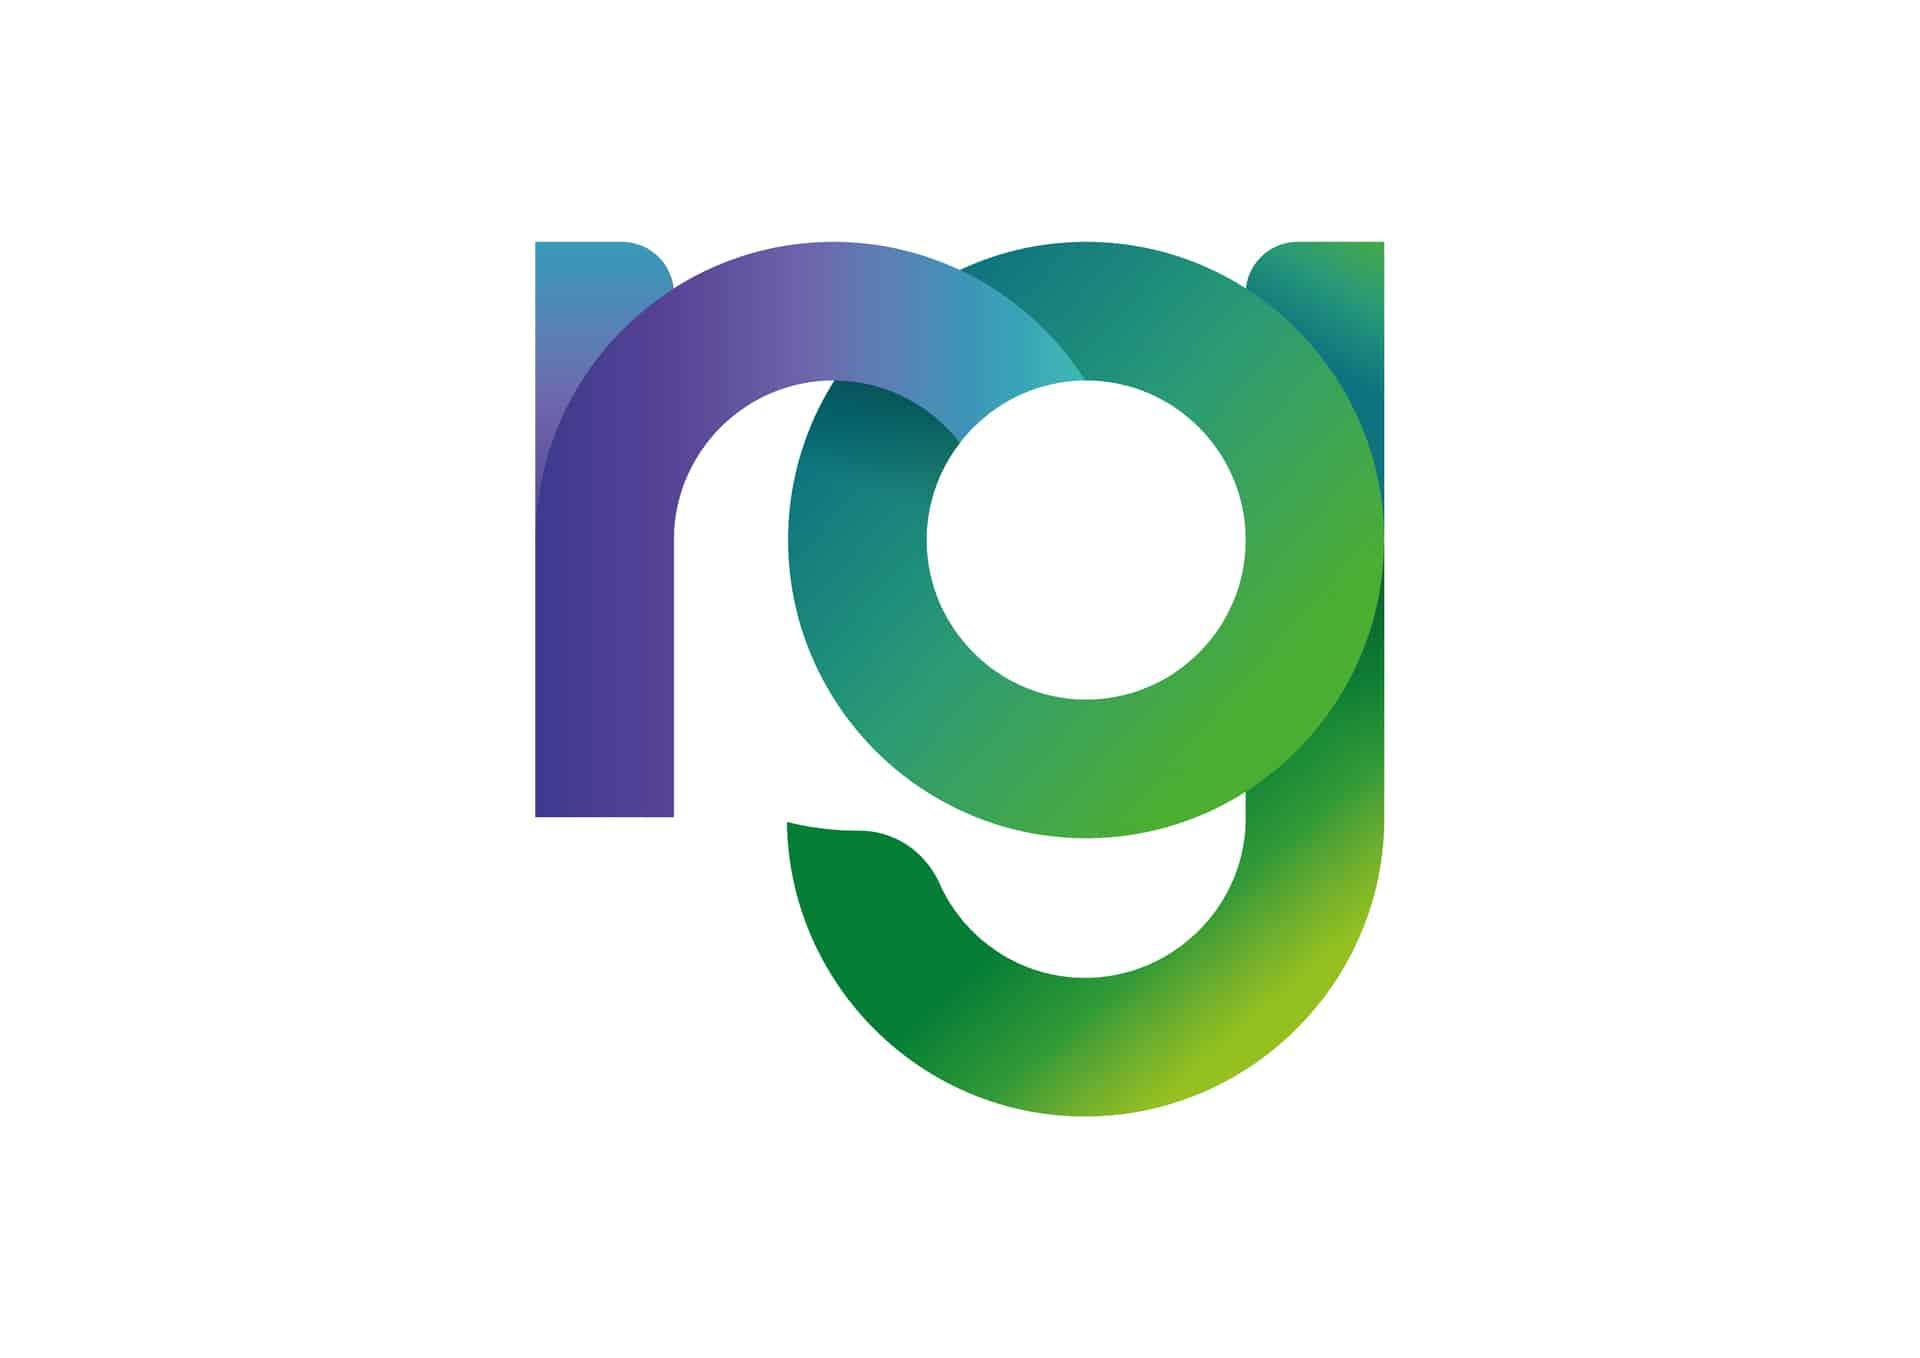 rix-green-logo__Colour-02